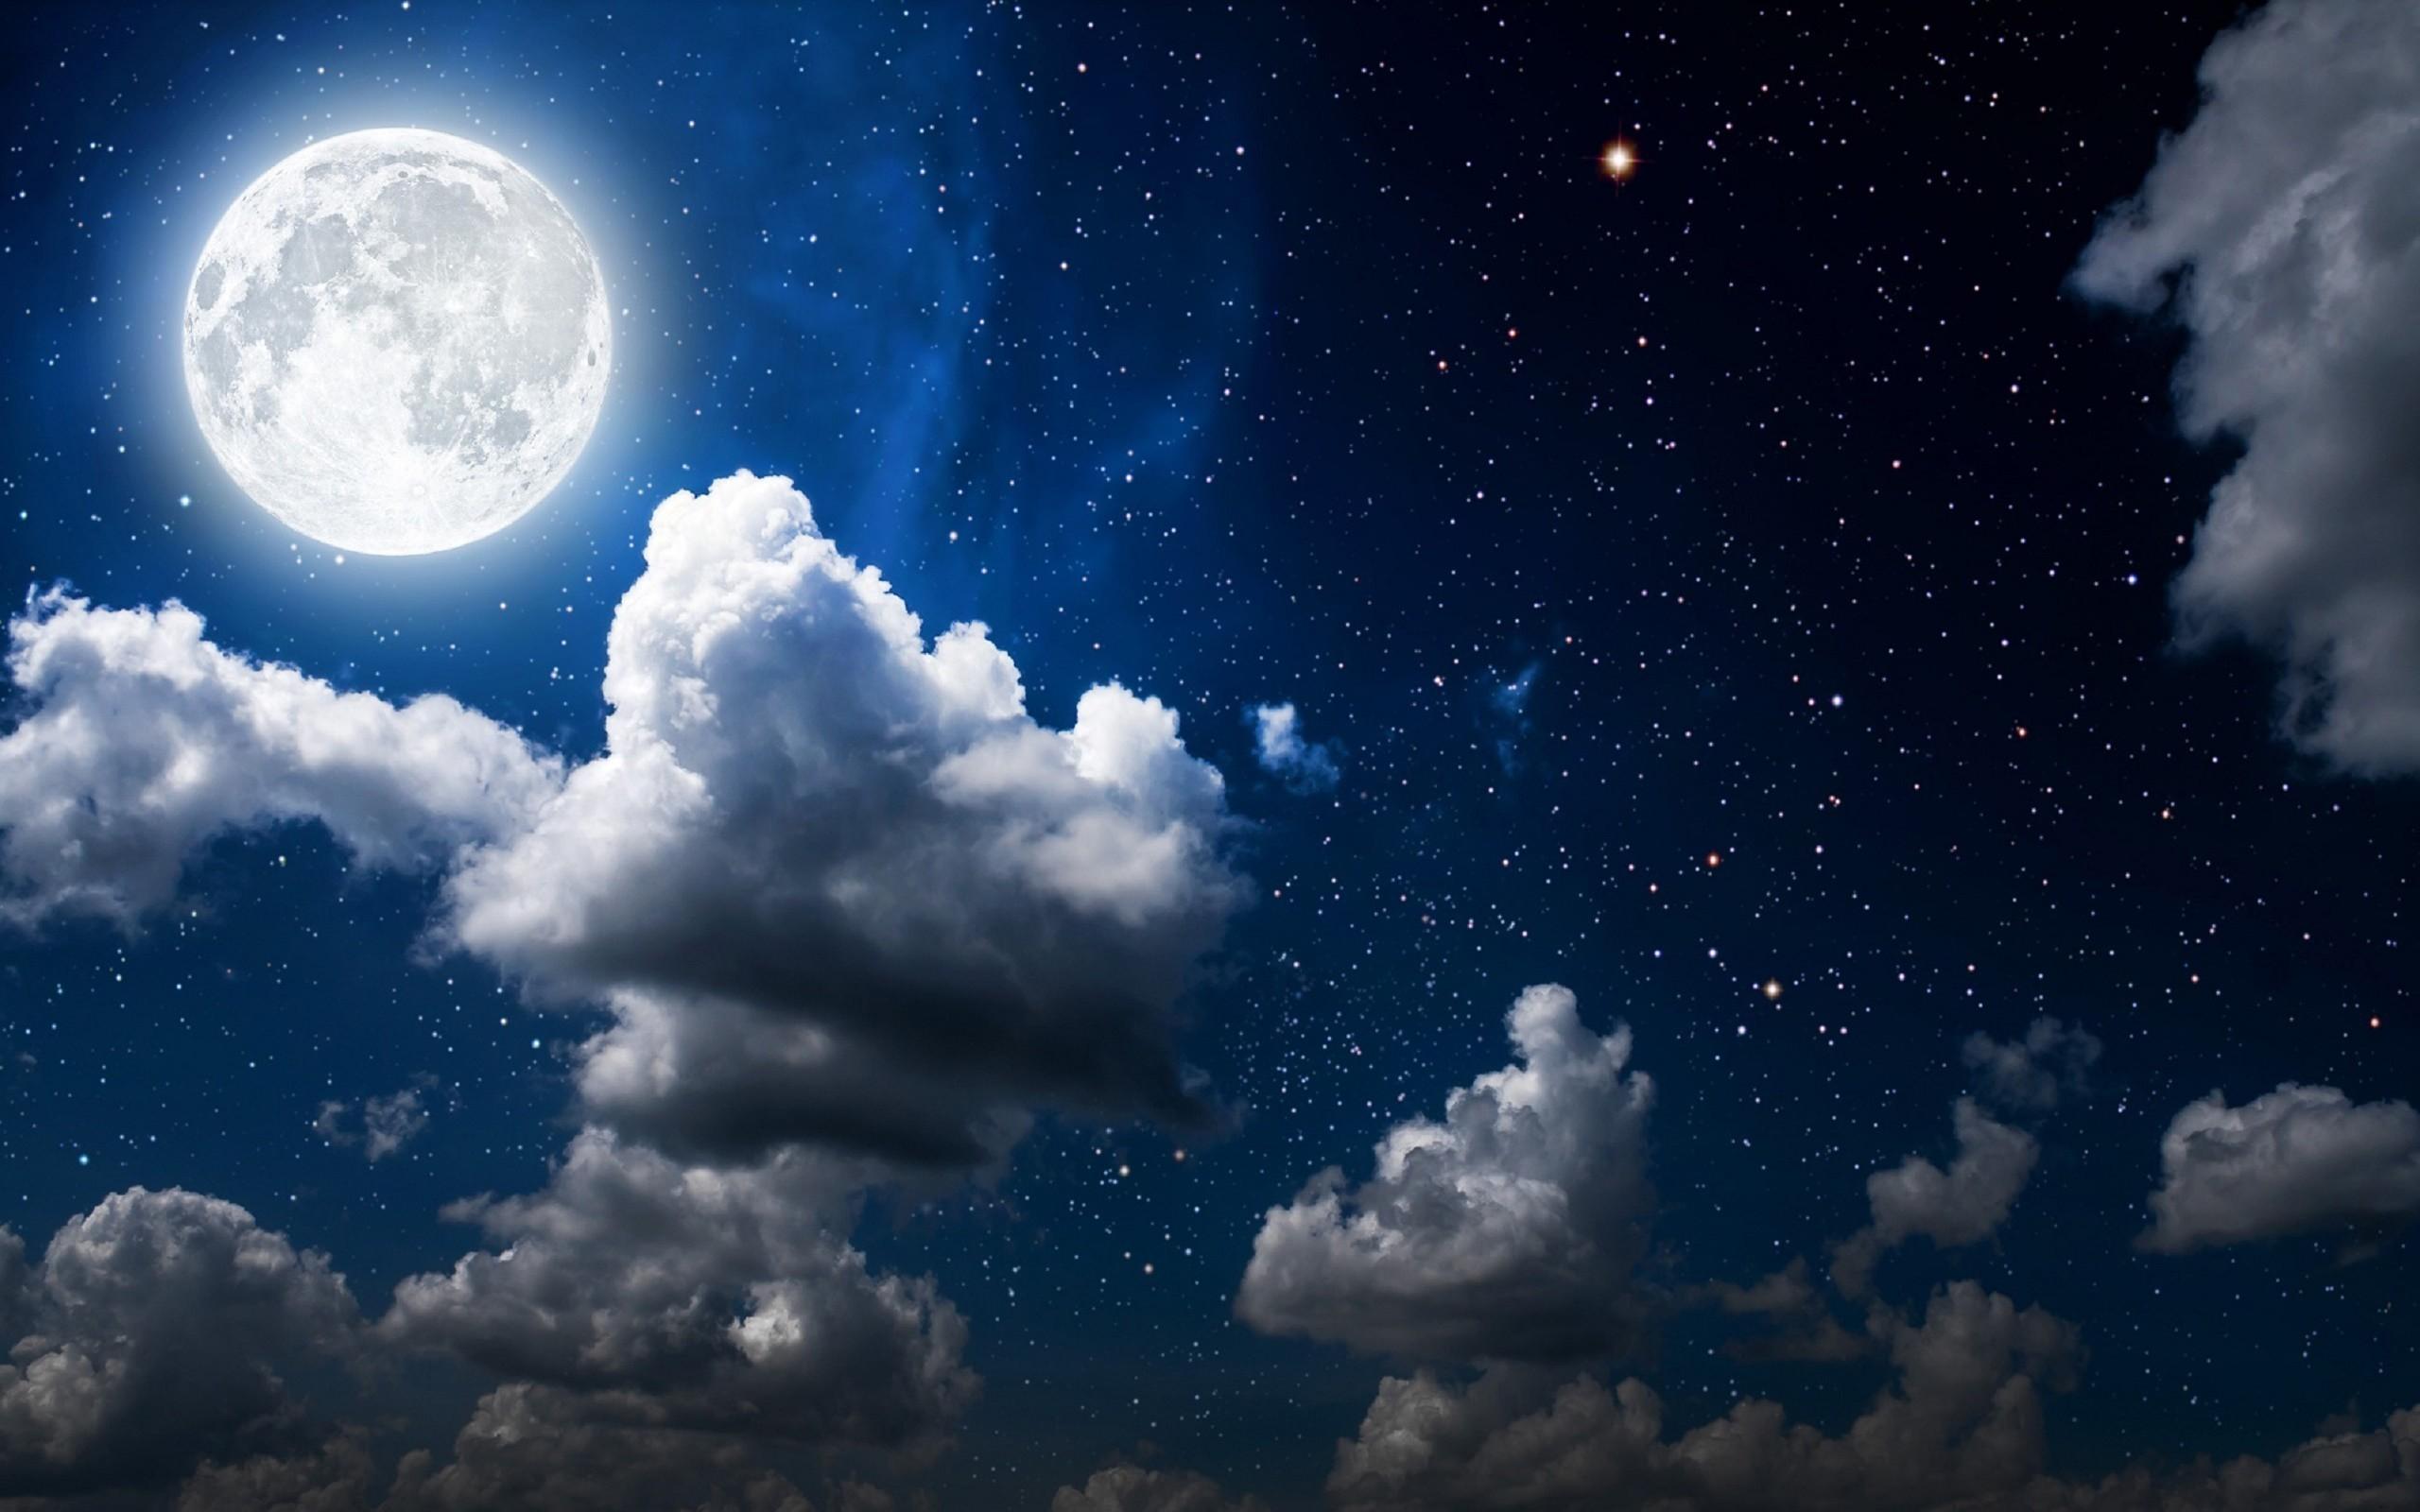 Moon Clouds Dark Sky Wallpapers HD Wallpapers ID 18374